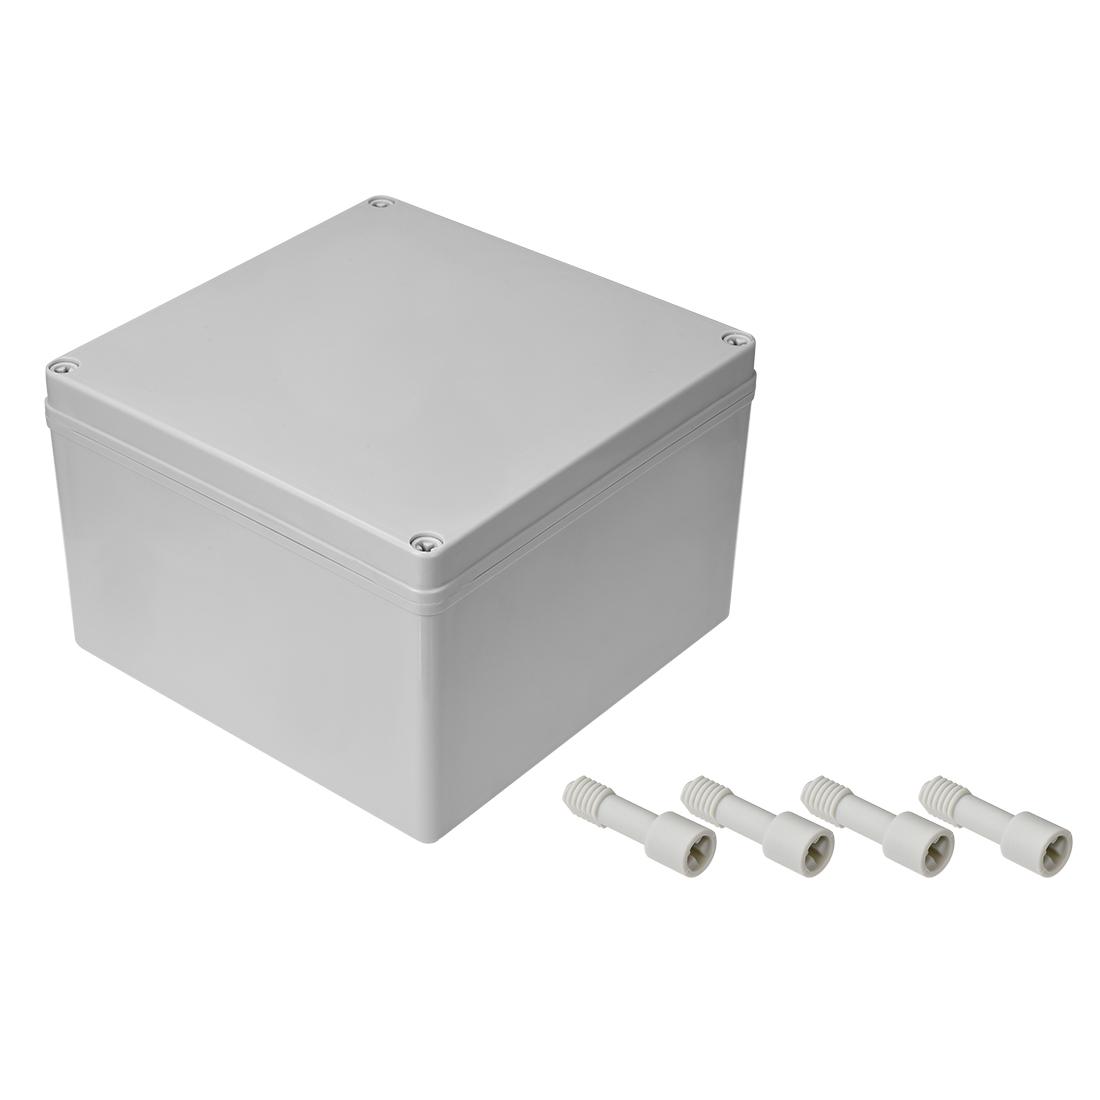 200mm x 200mm x 130mm Dustproof IP65 Junction Box DIY Case Enclosure Gray